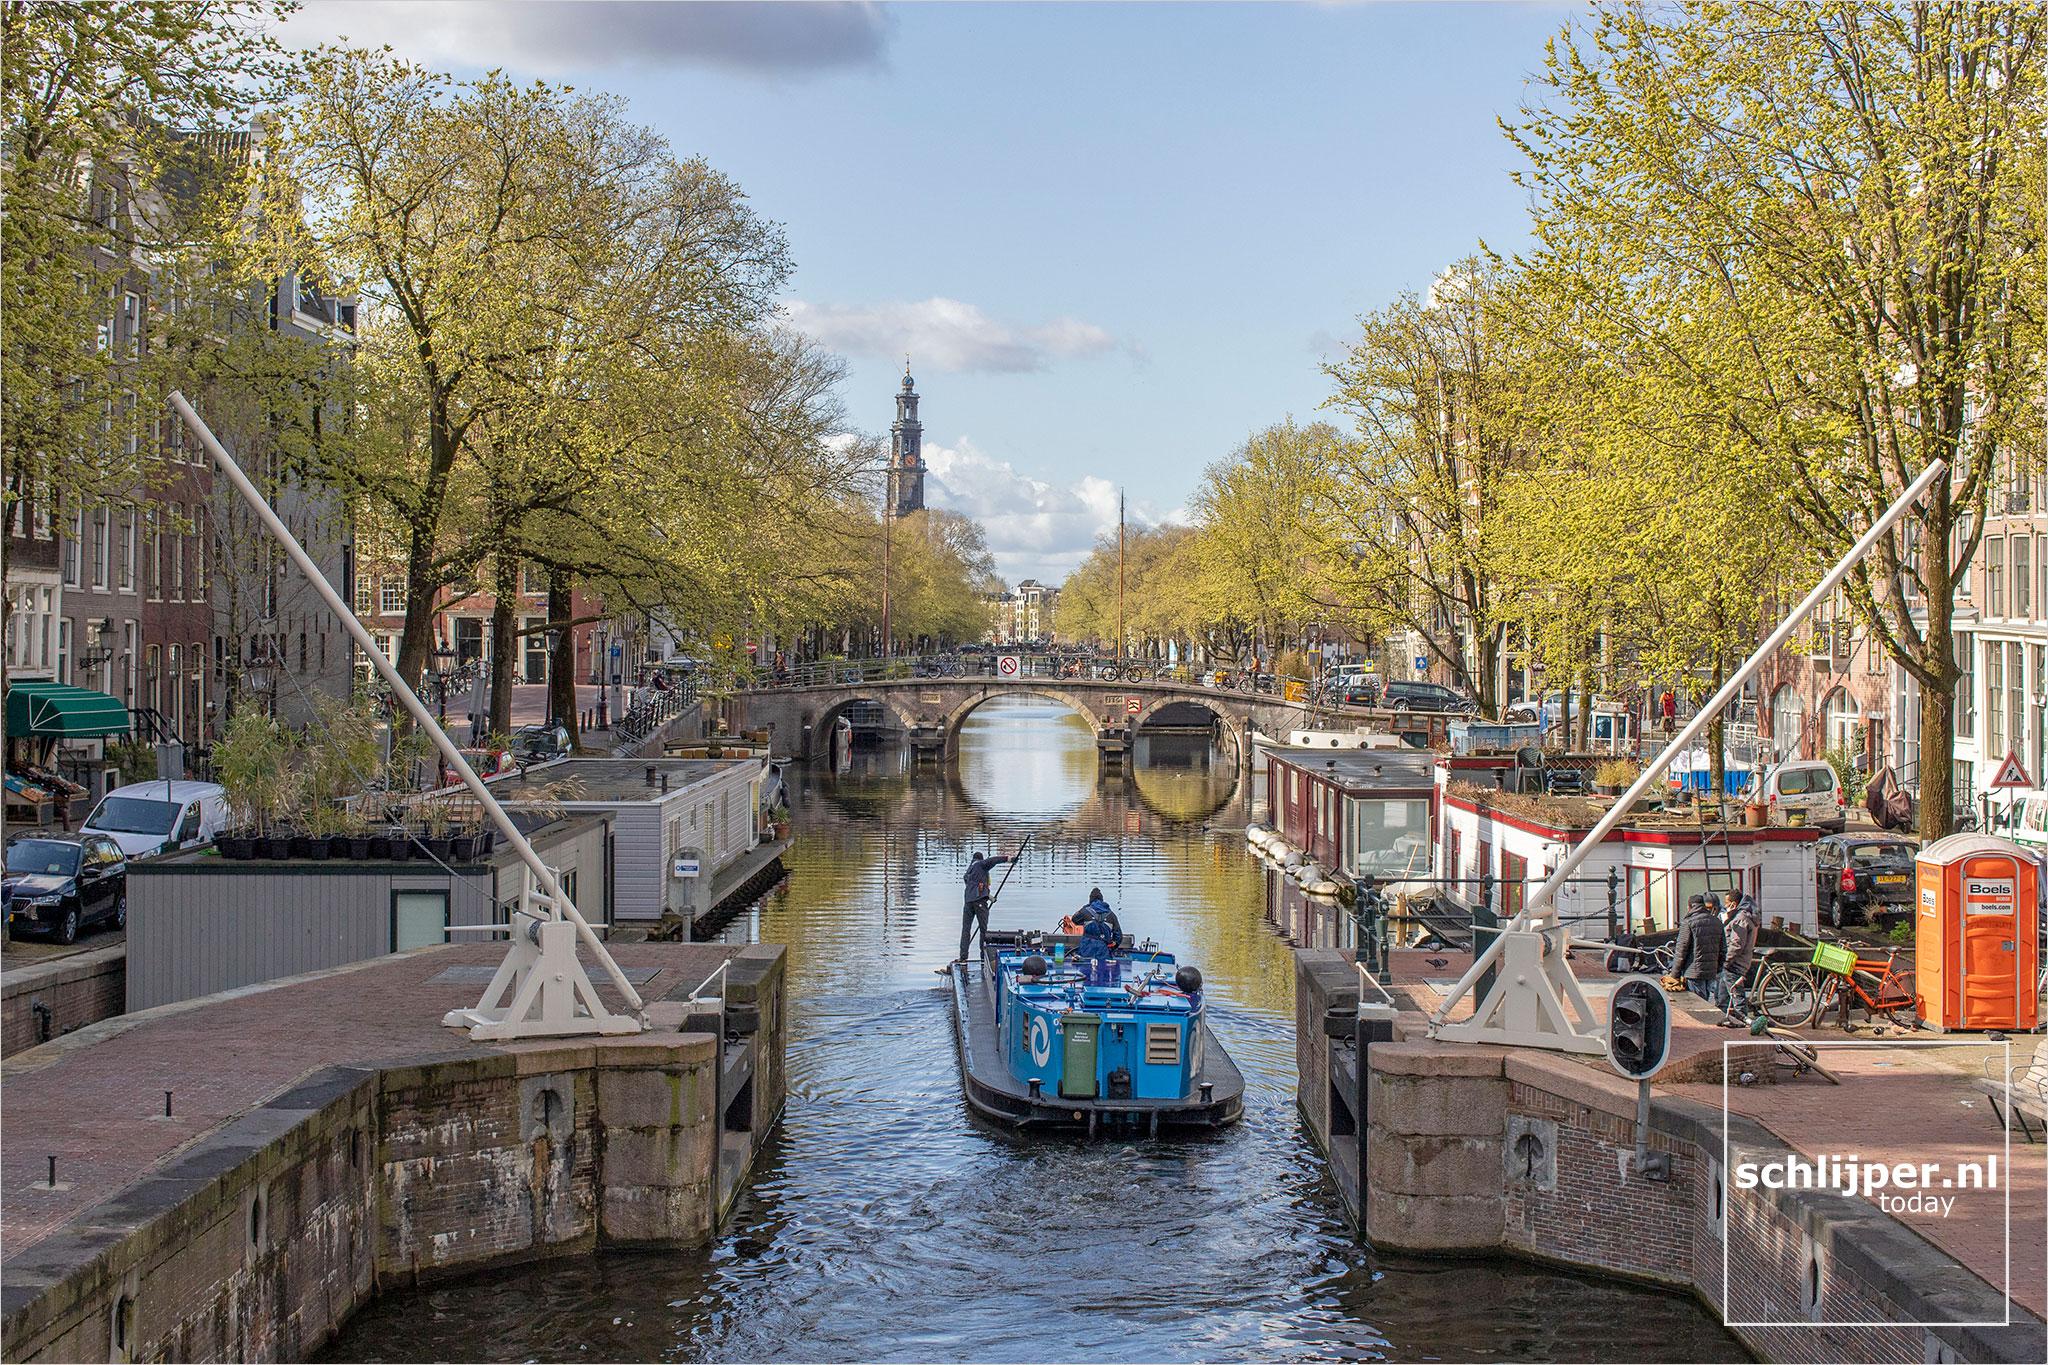 The Netherlands, Amsterdam, 12 april 2021